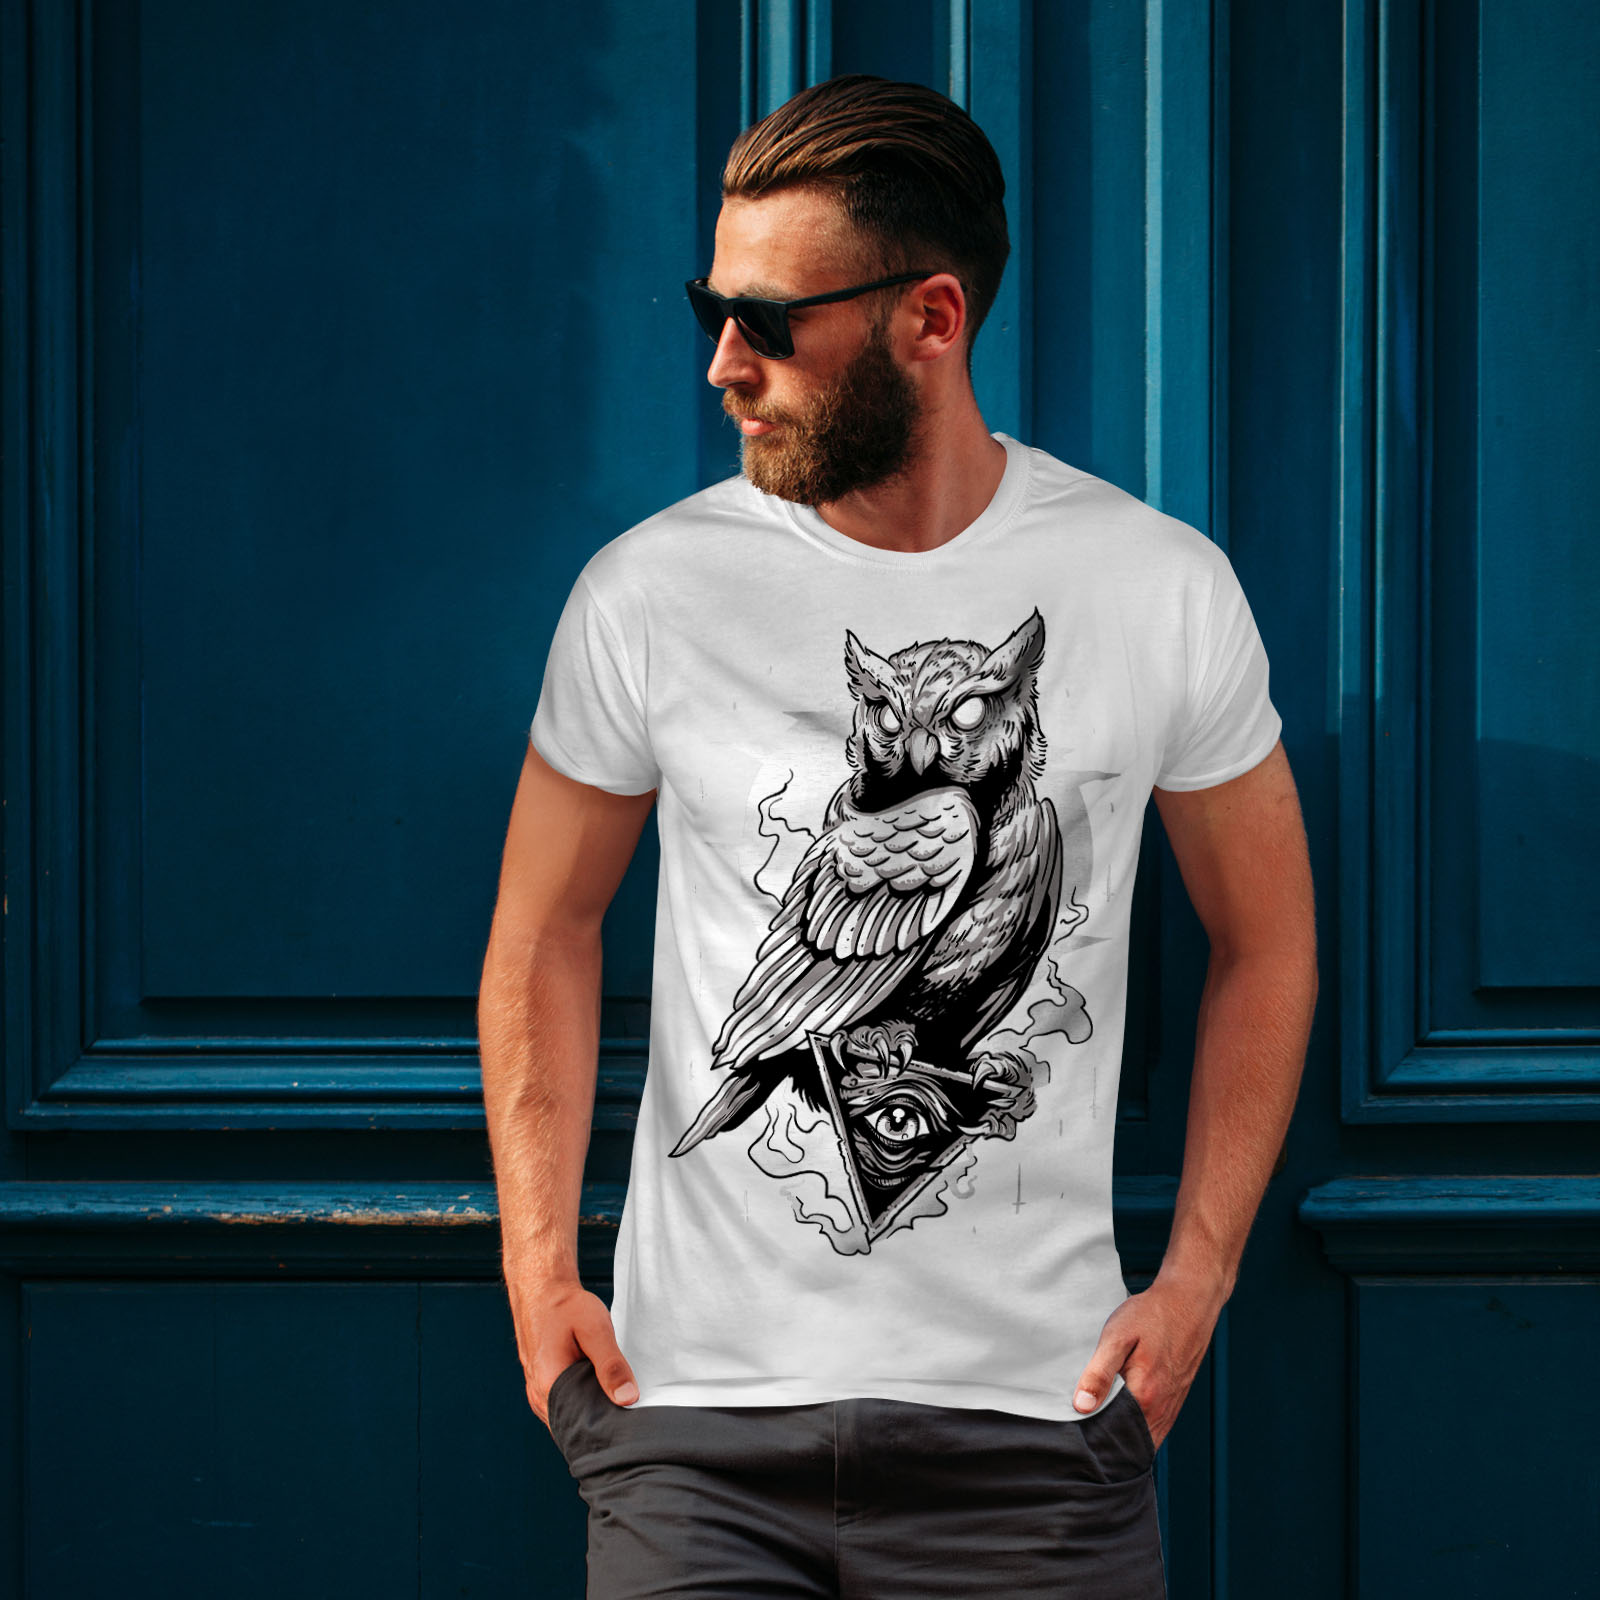 miniature 10 - Wellcoda Triangle Owl Mens T-shirt, Conspiracy Graphic Design Printed Tee